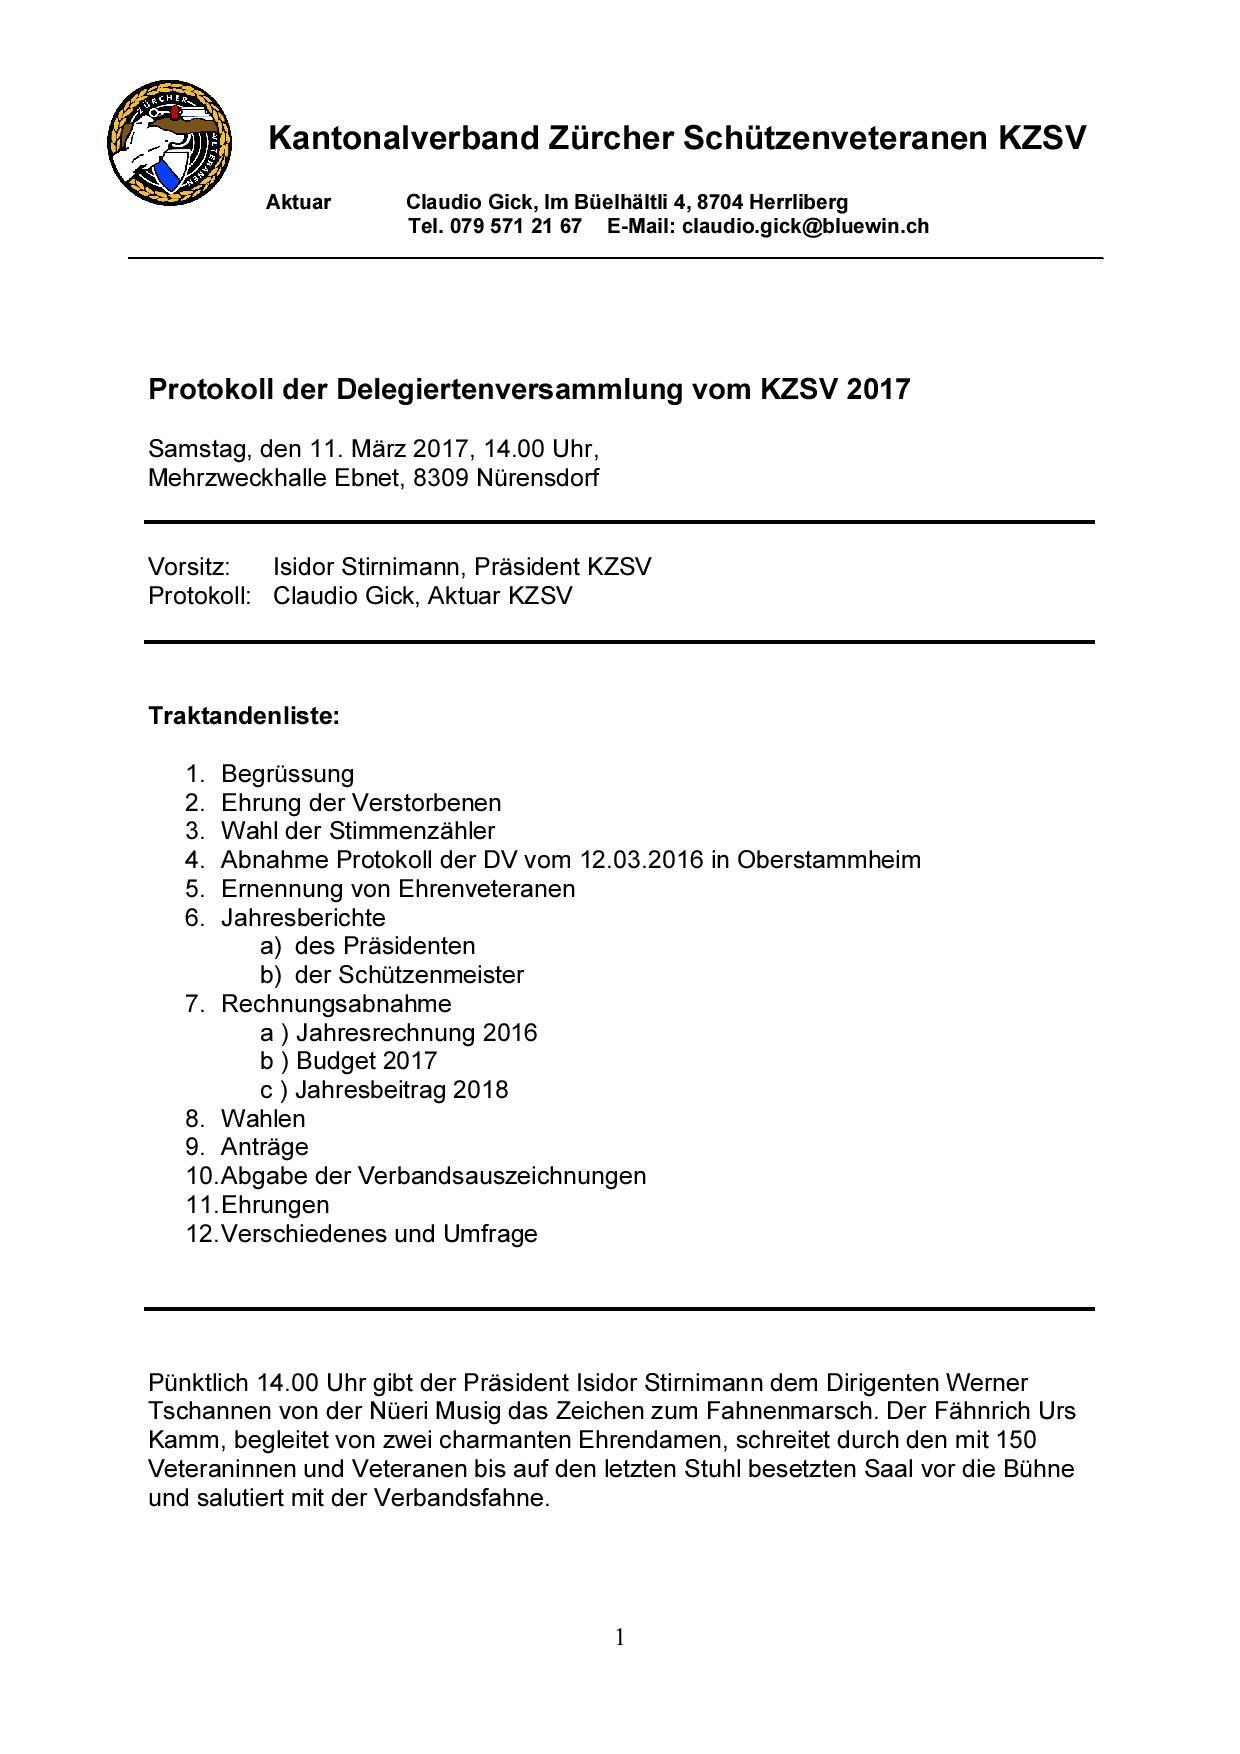 protokoll-dv-kzsv-2017-1-page-001jpg